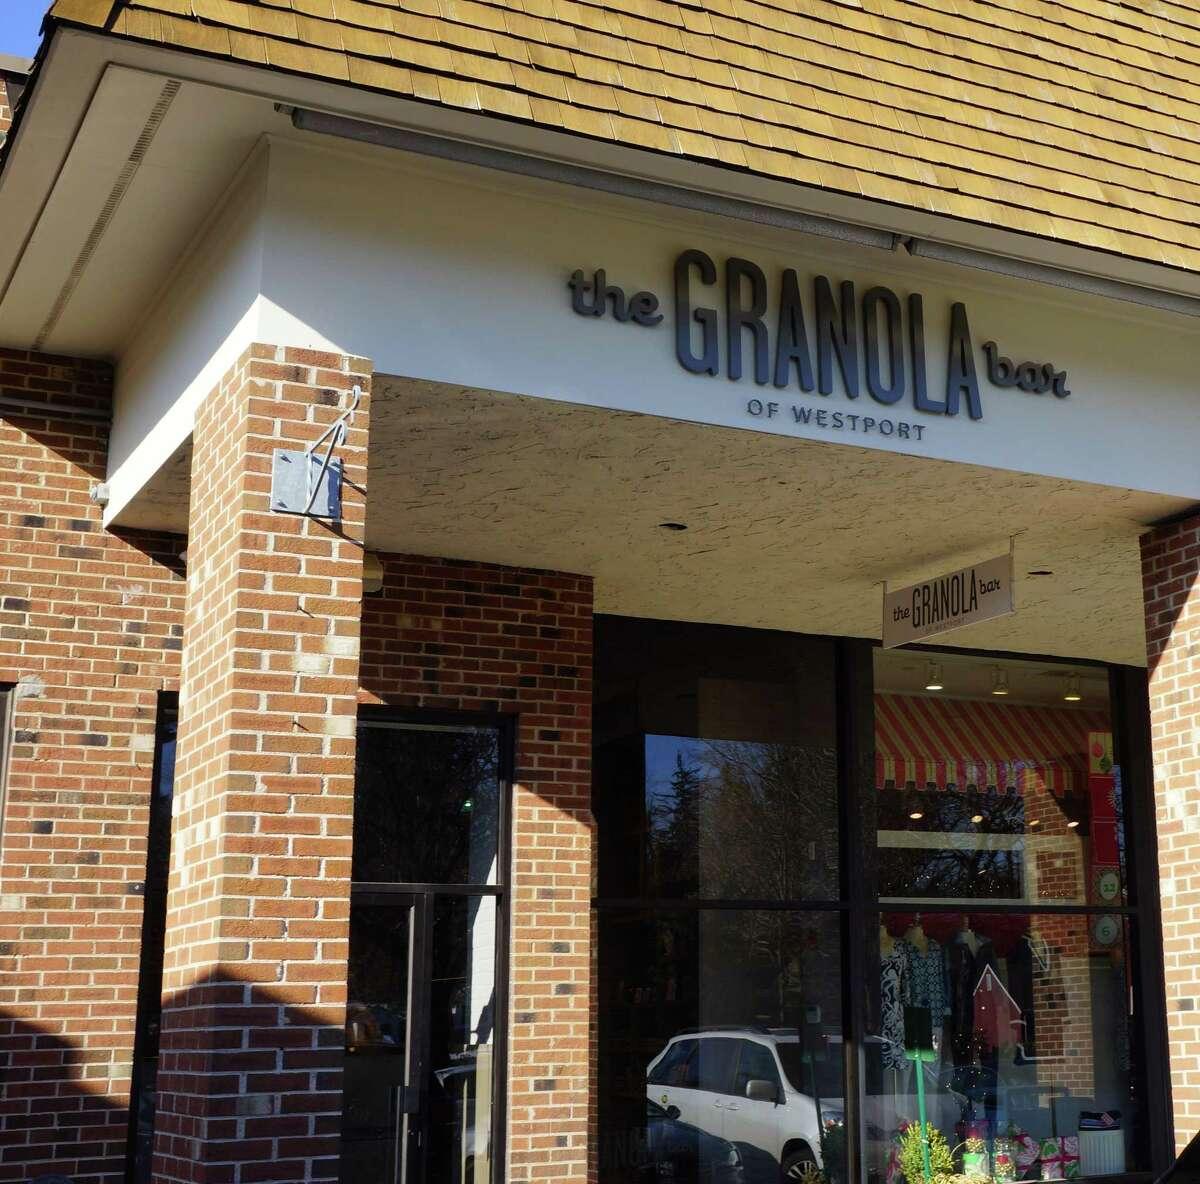 The Granola Bar Playhouse Square, 275 Post Road E. in Westport.